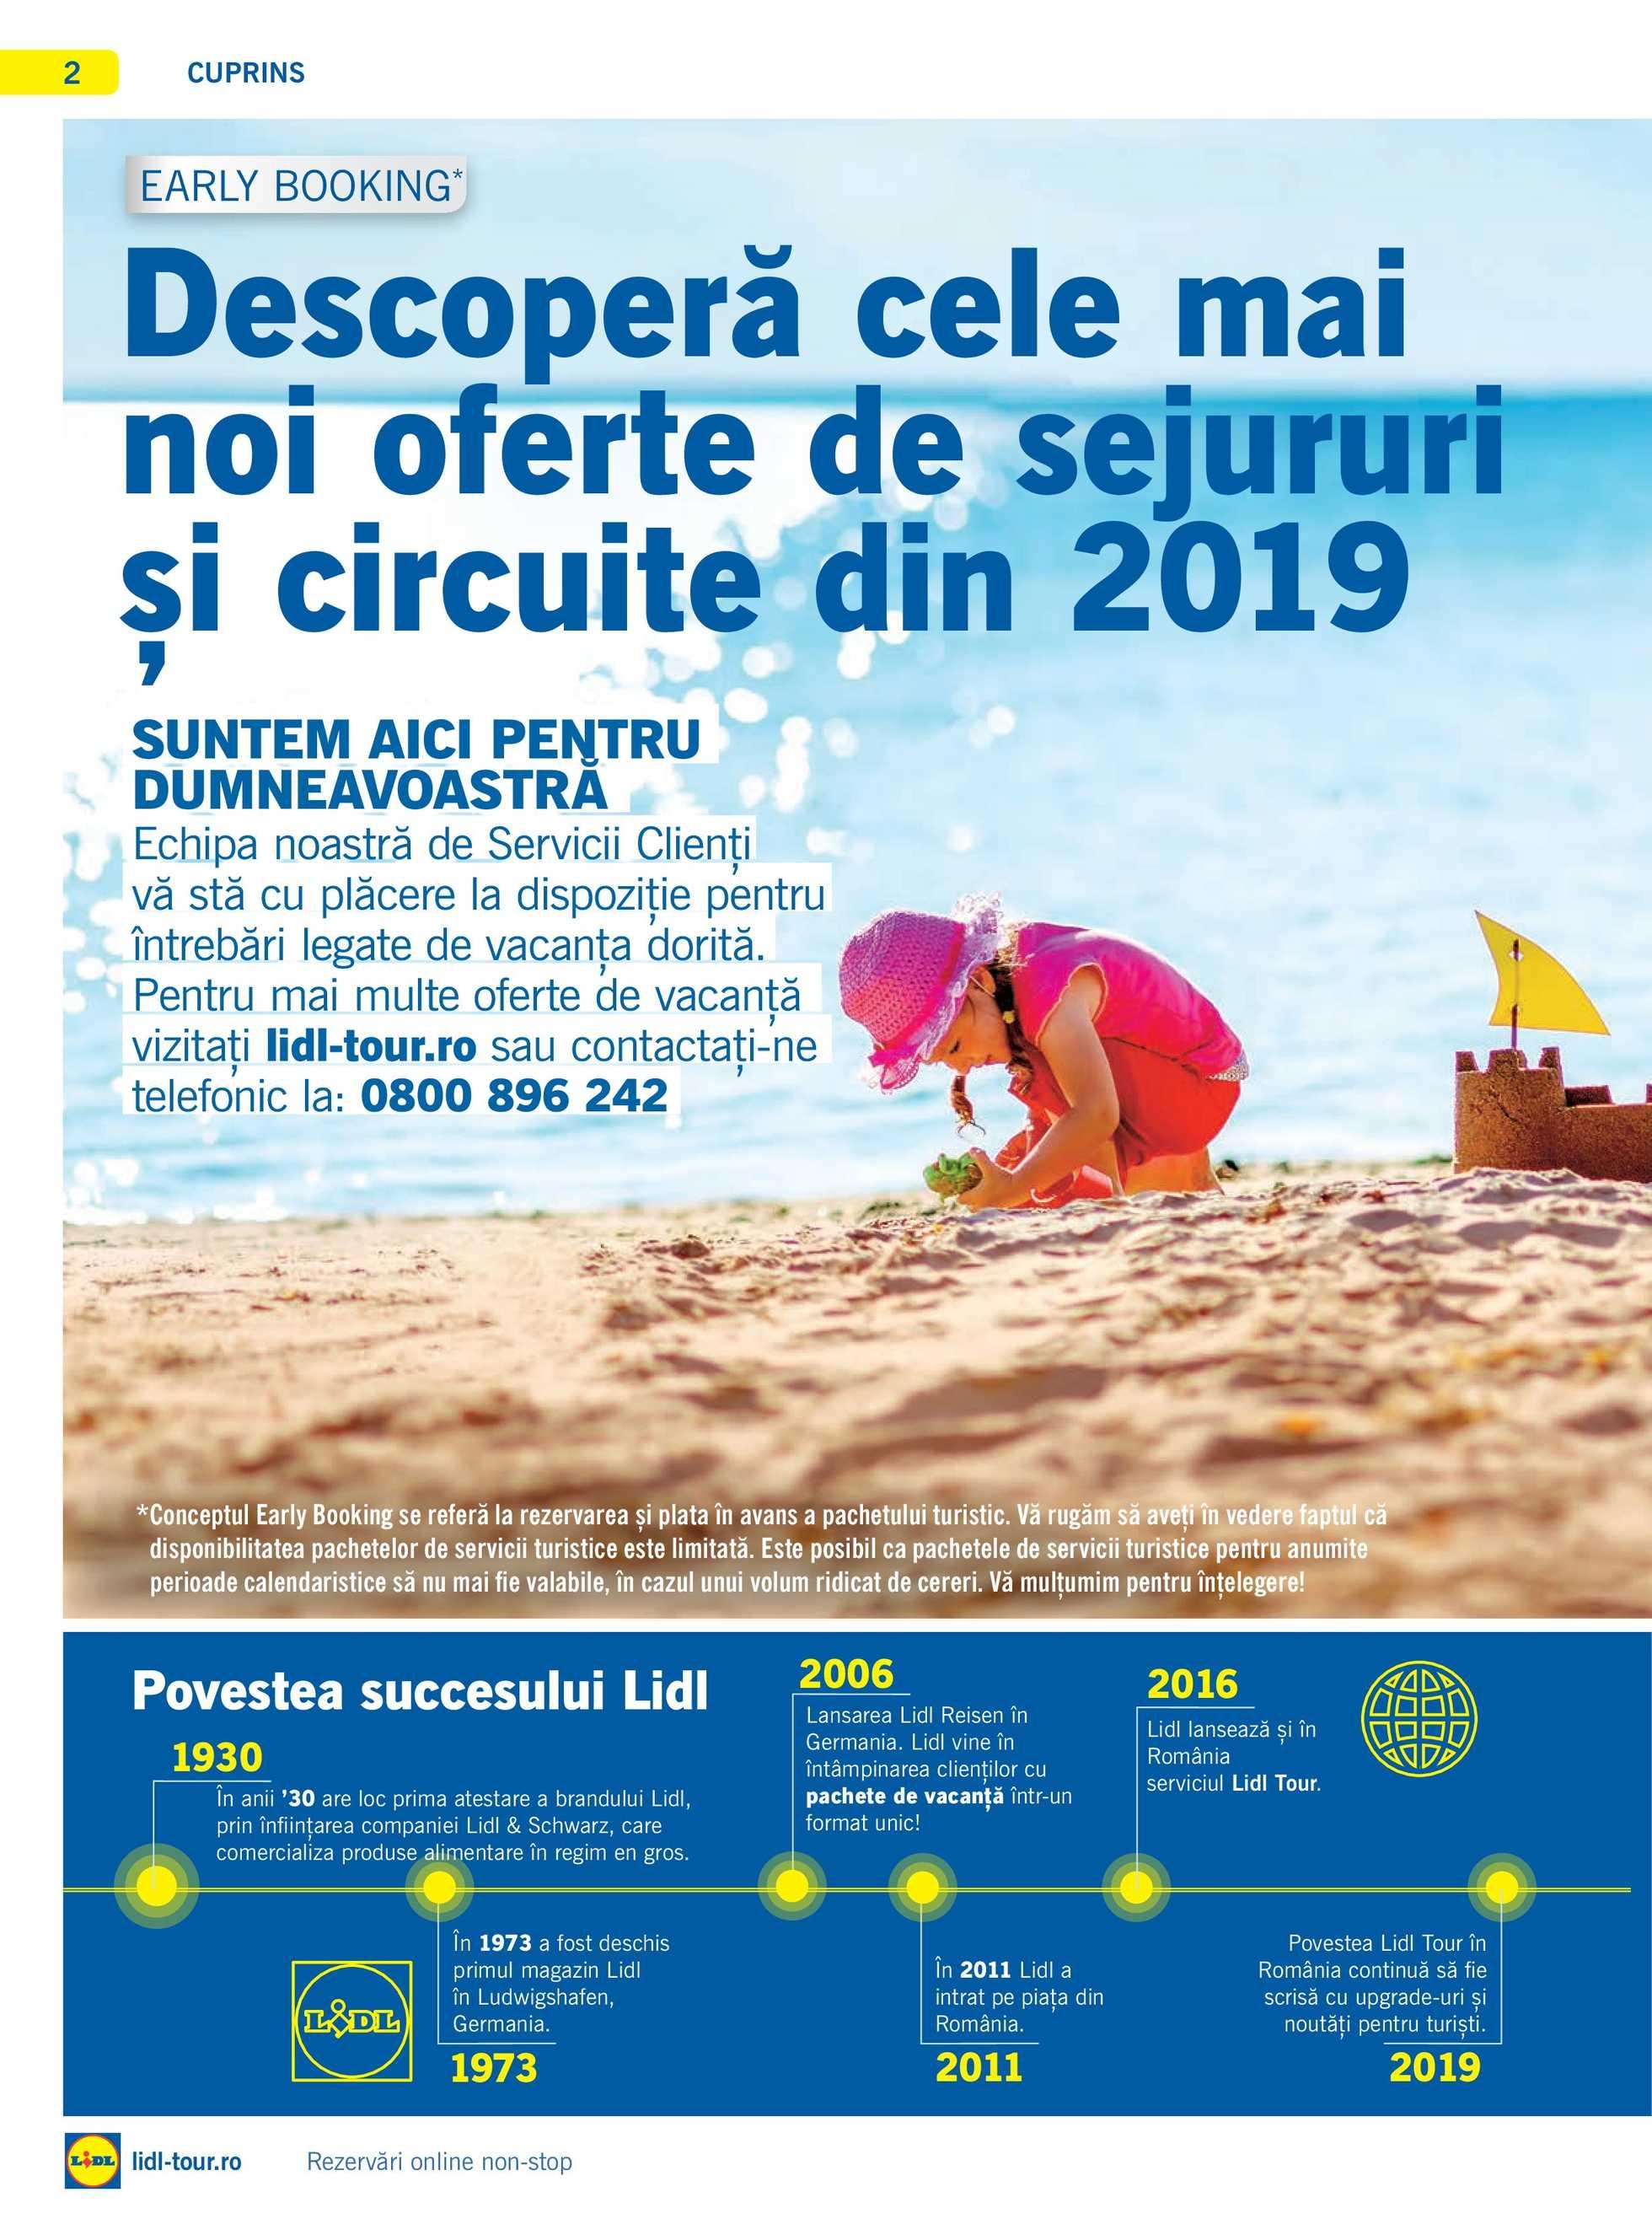 Lidl - NEWSPAPERS_singleNewspaper_alt_presentationSliderItem_startAt 2019-01-01 - pagină 2